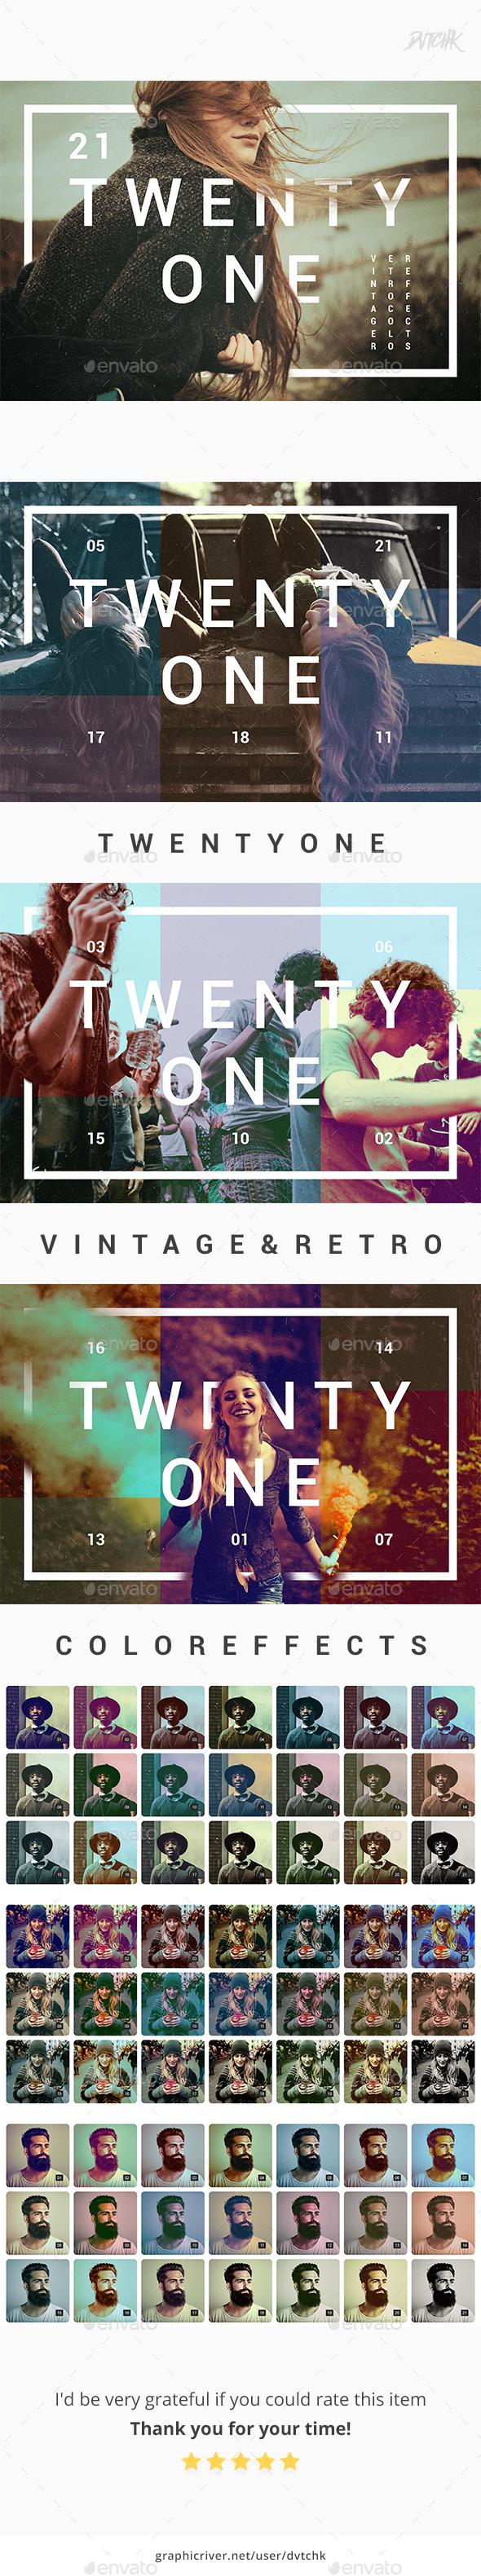 21 | Vintage & Retro Color Effects - Photo Templates Graphics